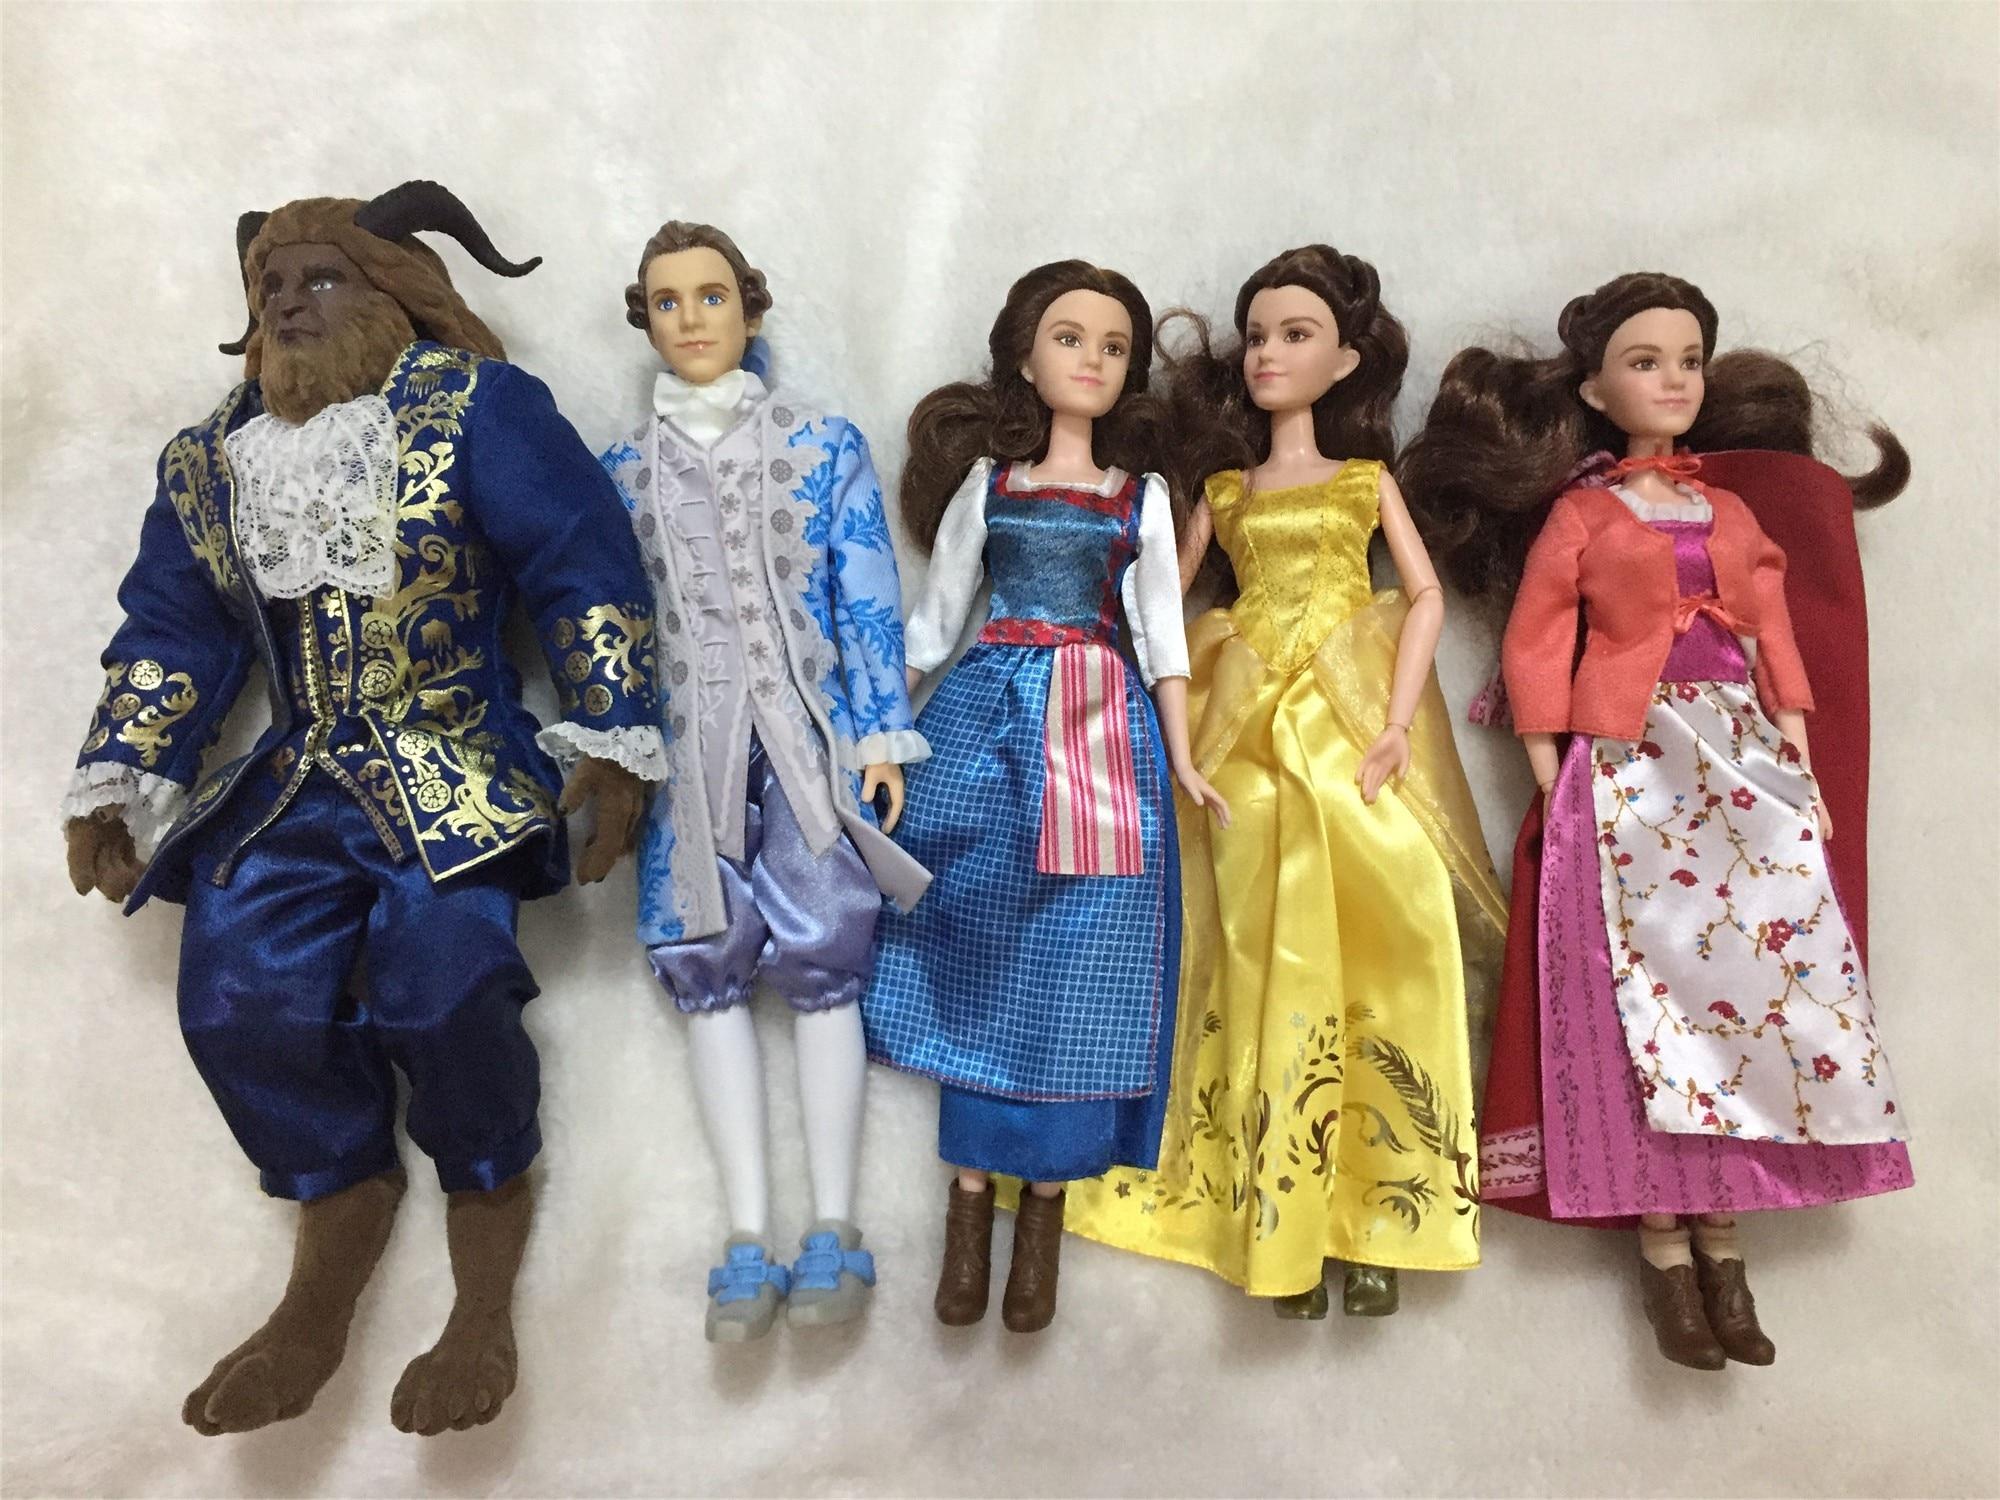 12'' Original Rapunzel Doll Rapunzel Classic Beast And Belle Doll  Figure For Girls Bjd Blyth Doll